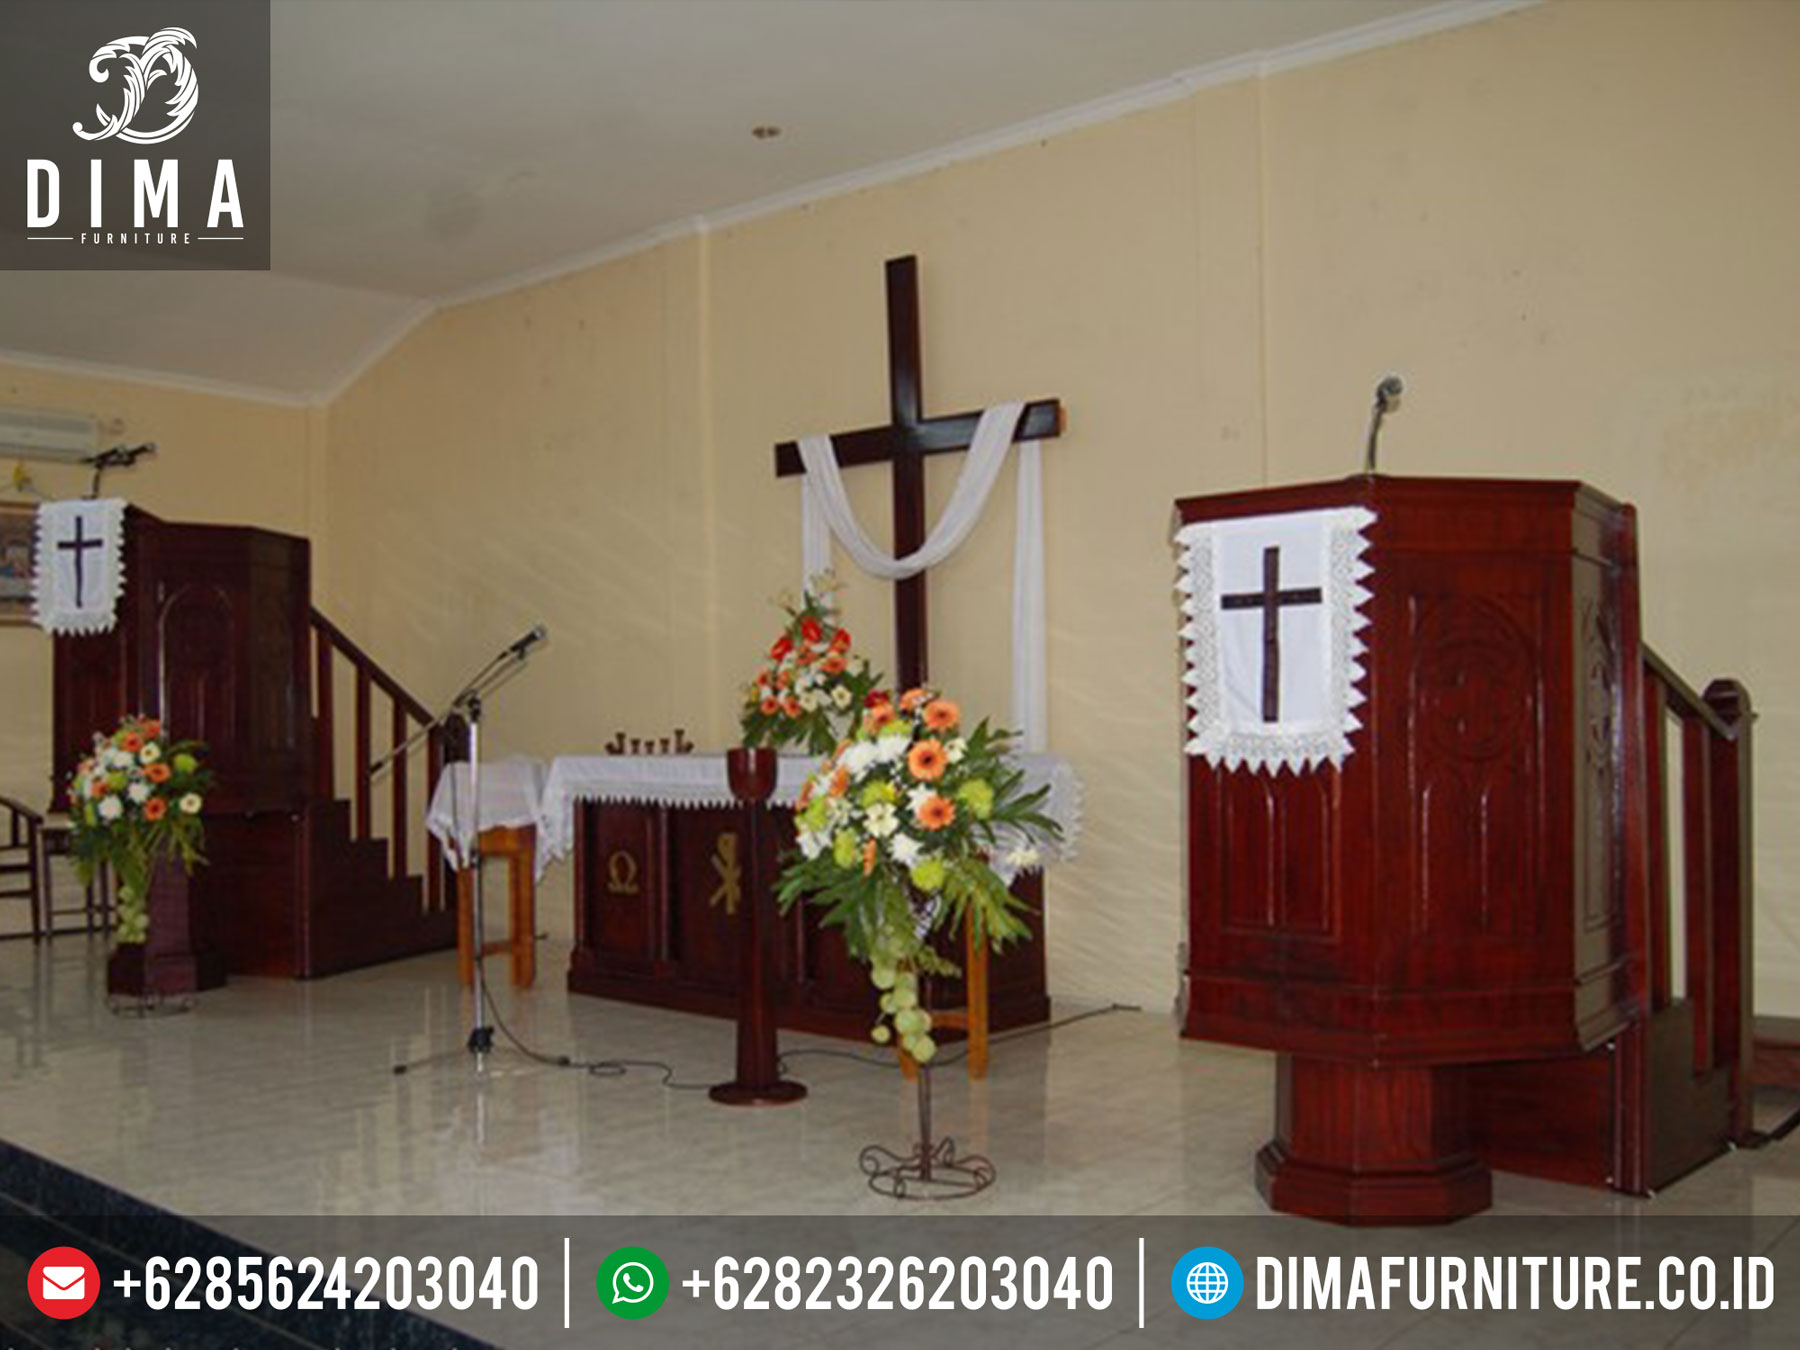 Mimbar Gereja Kristen Minimalis, Podium Gereja Terbaru Jepara, Mimbar Ceramah Gereja ST-0331